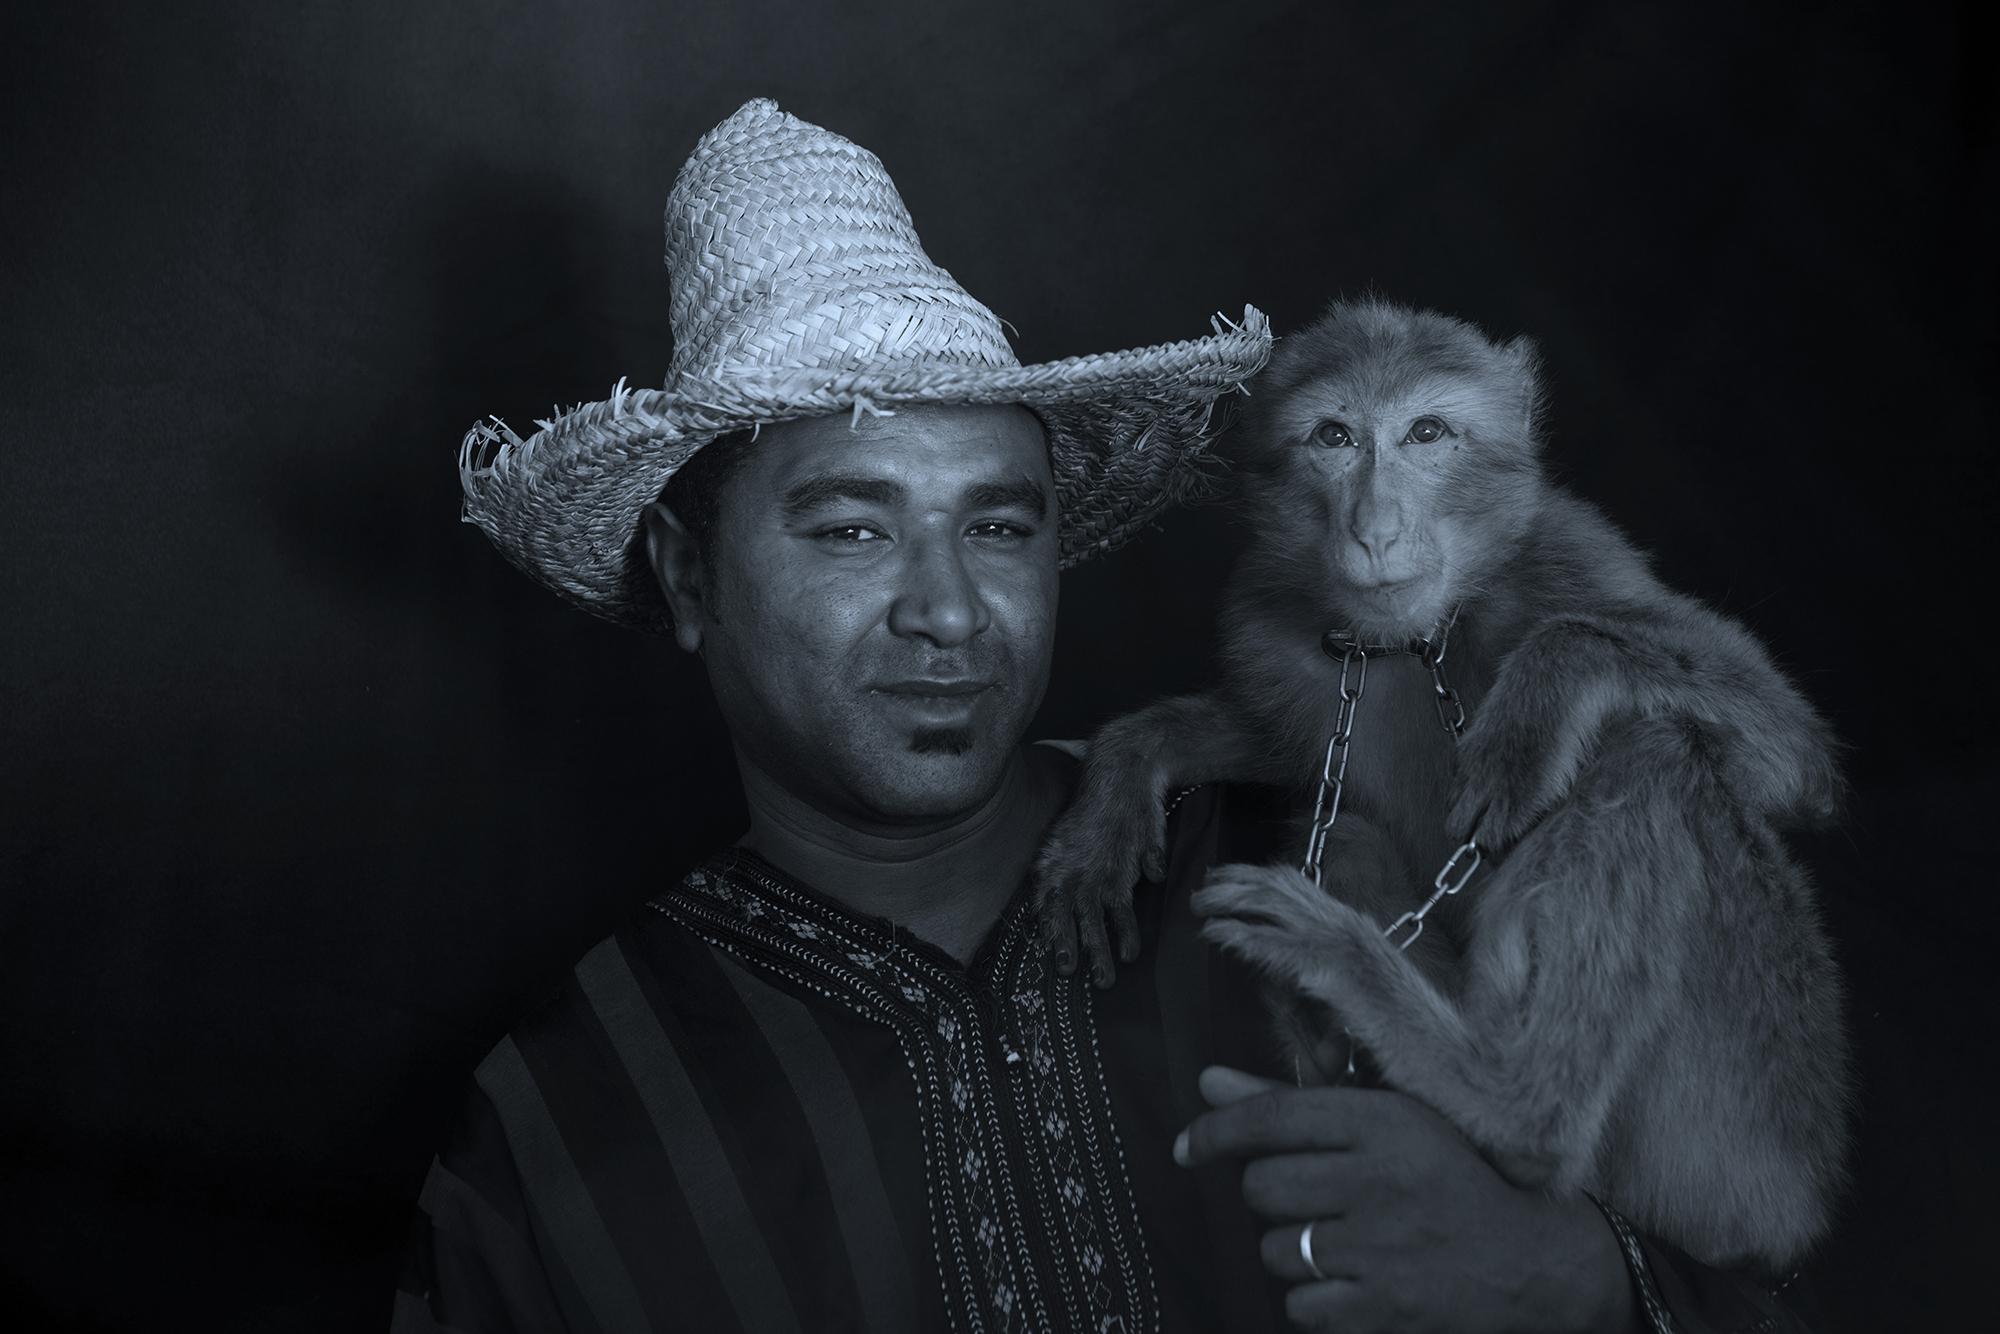 monkey2 copy copy.jpg